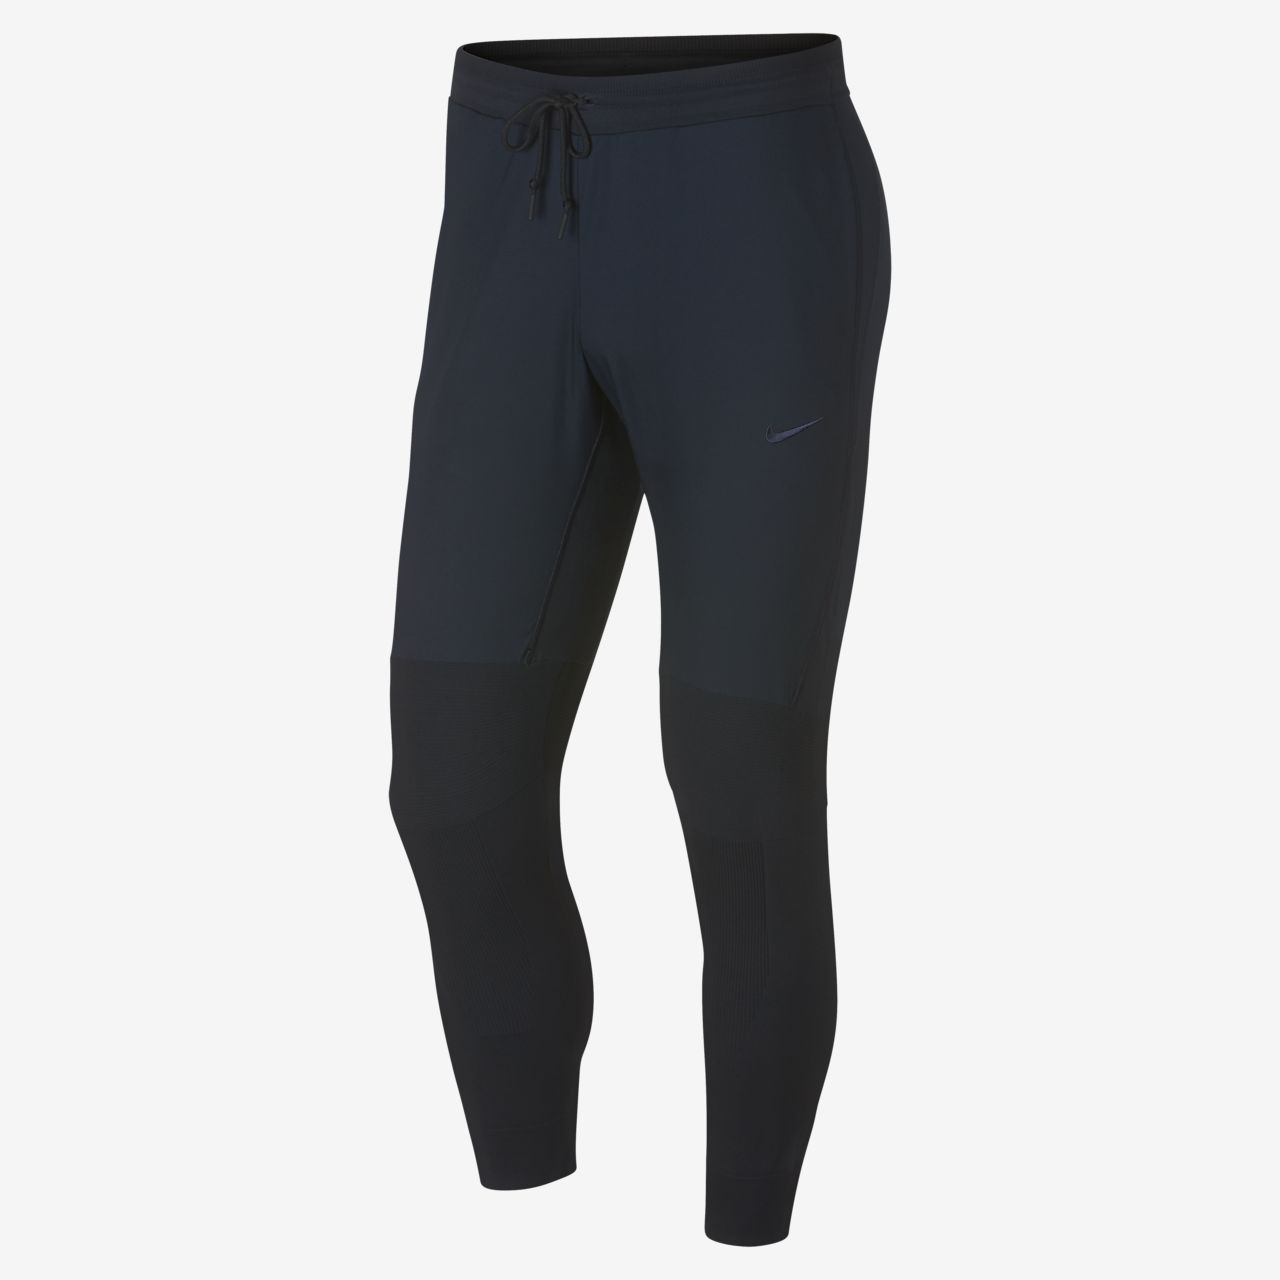 61ff27d023 Pantalon FFF Tech Knit pour Homme. Nike.com MA